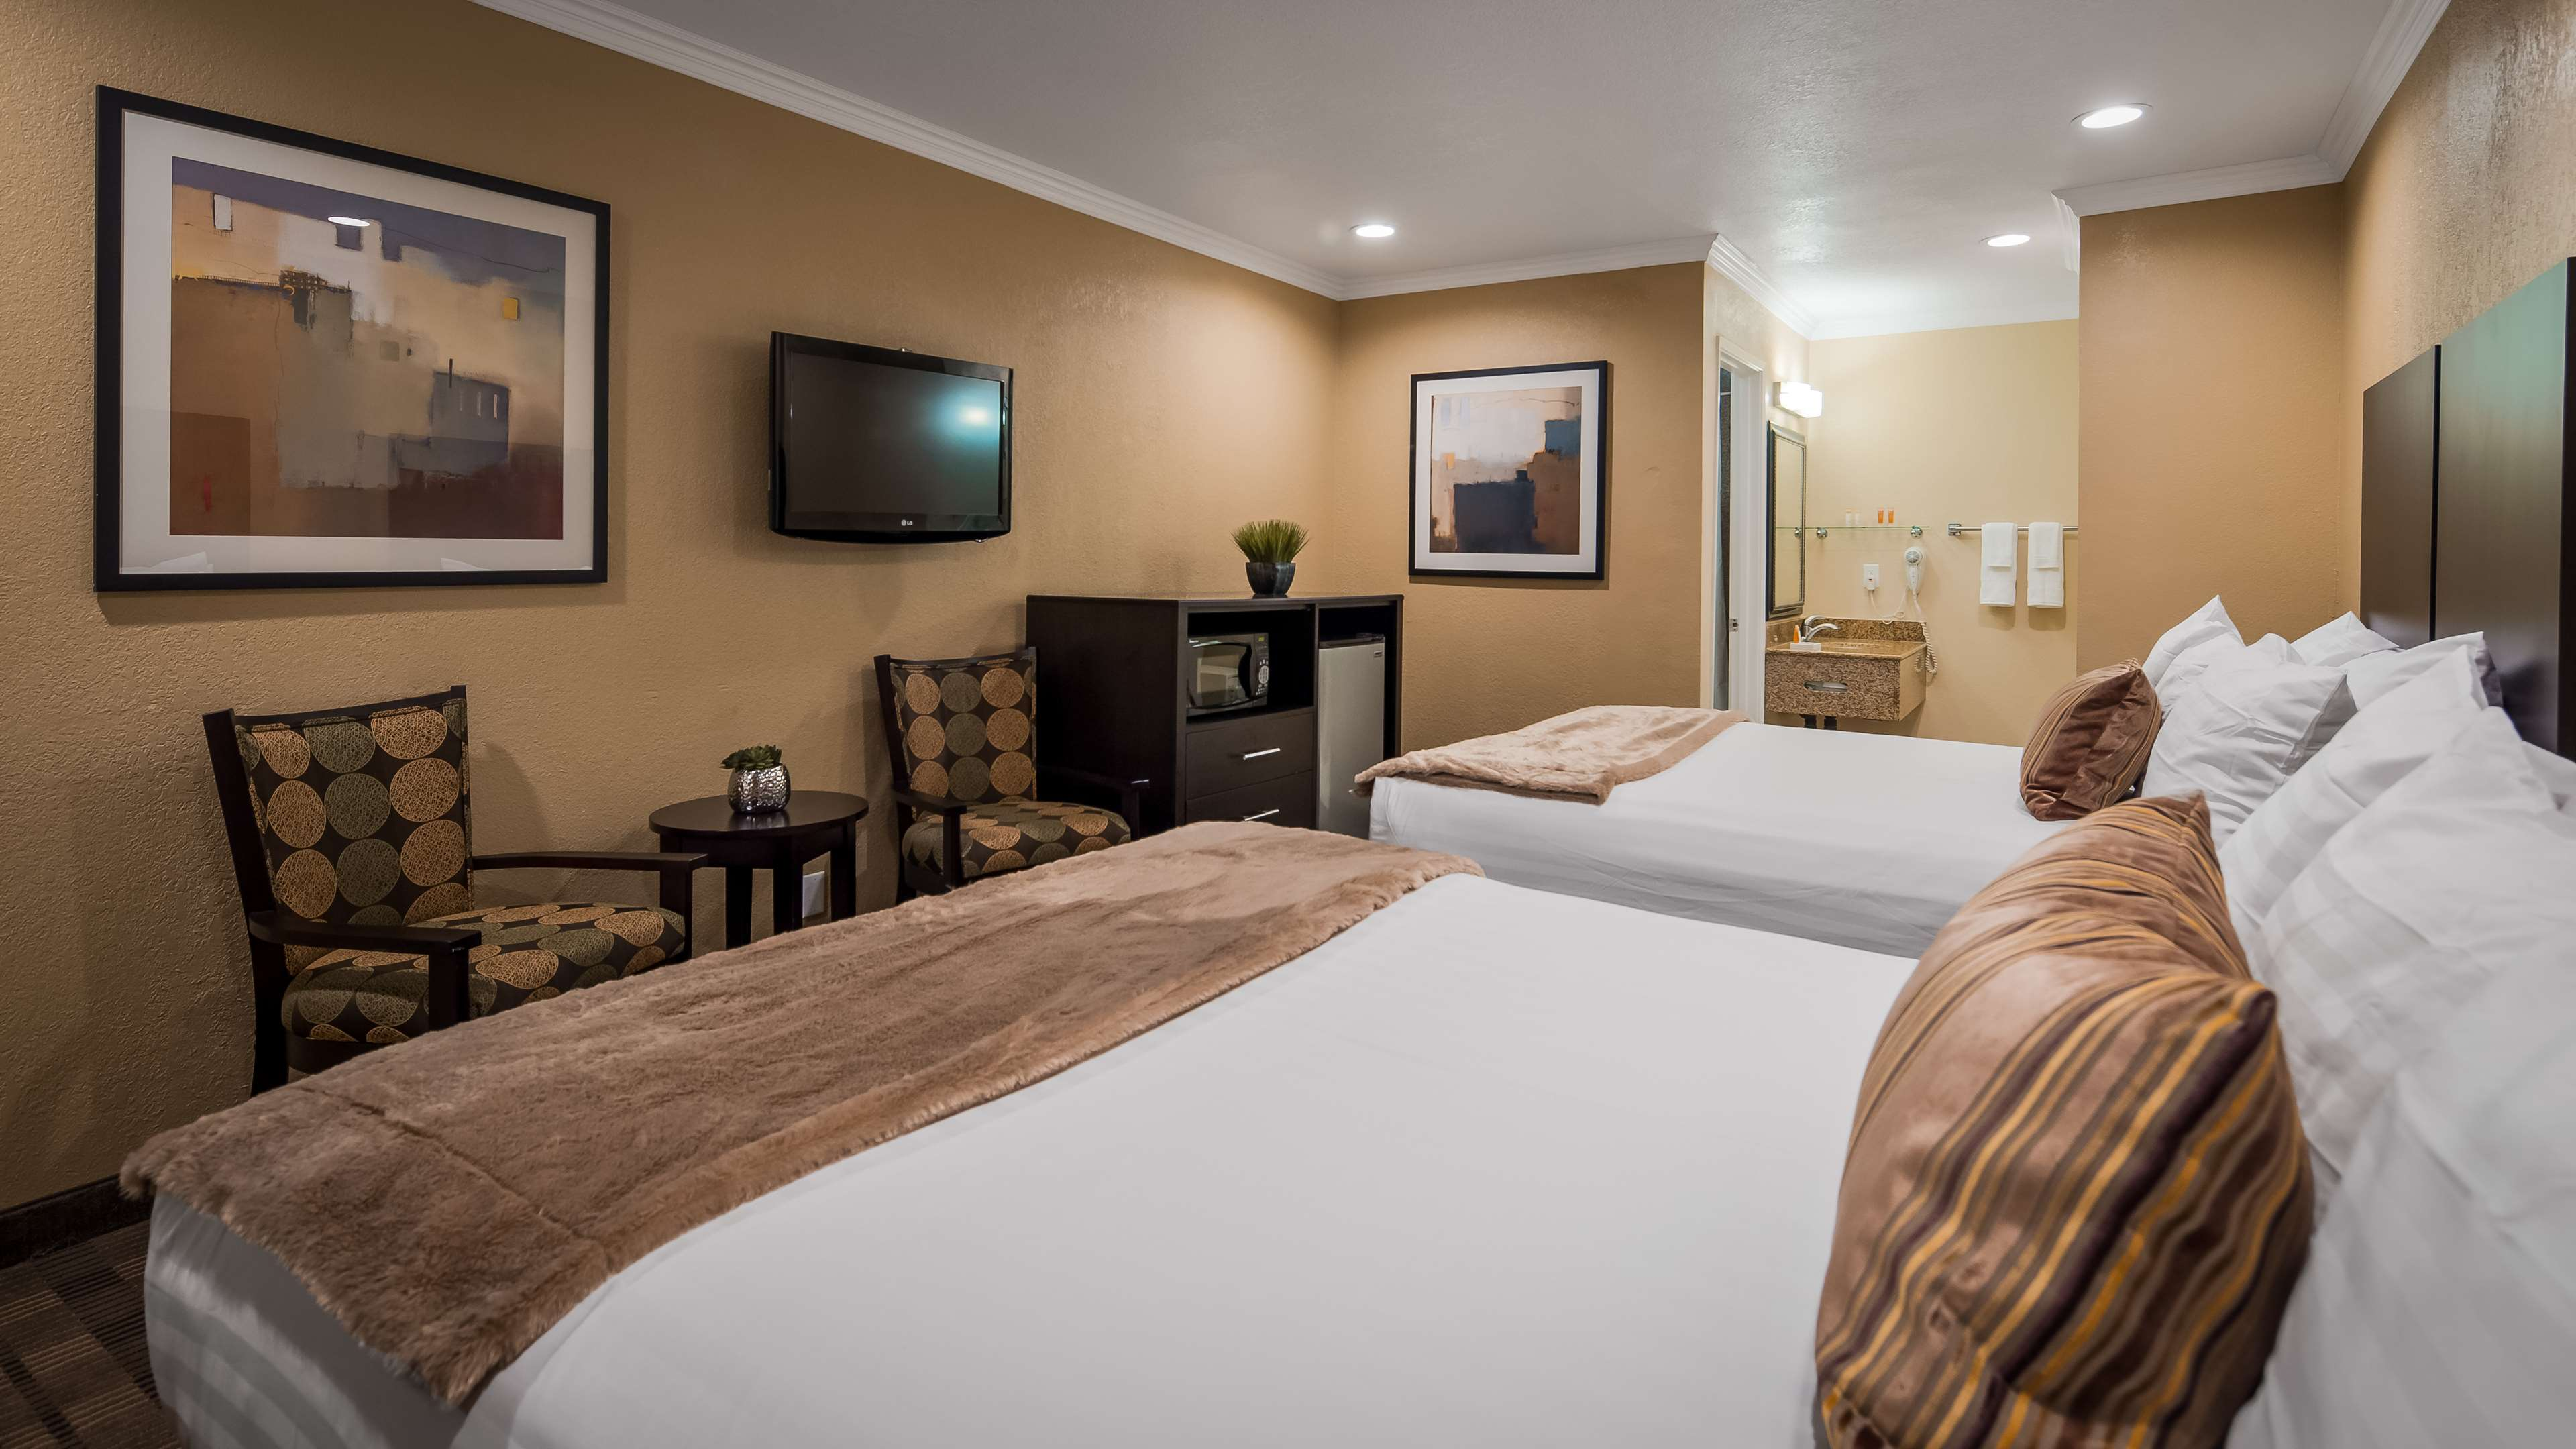 Best Western Poway/San Diego Hotel image 5